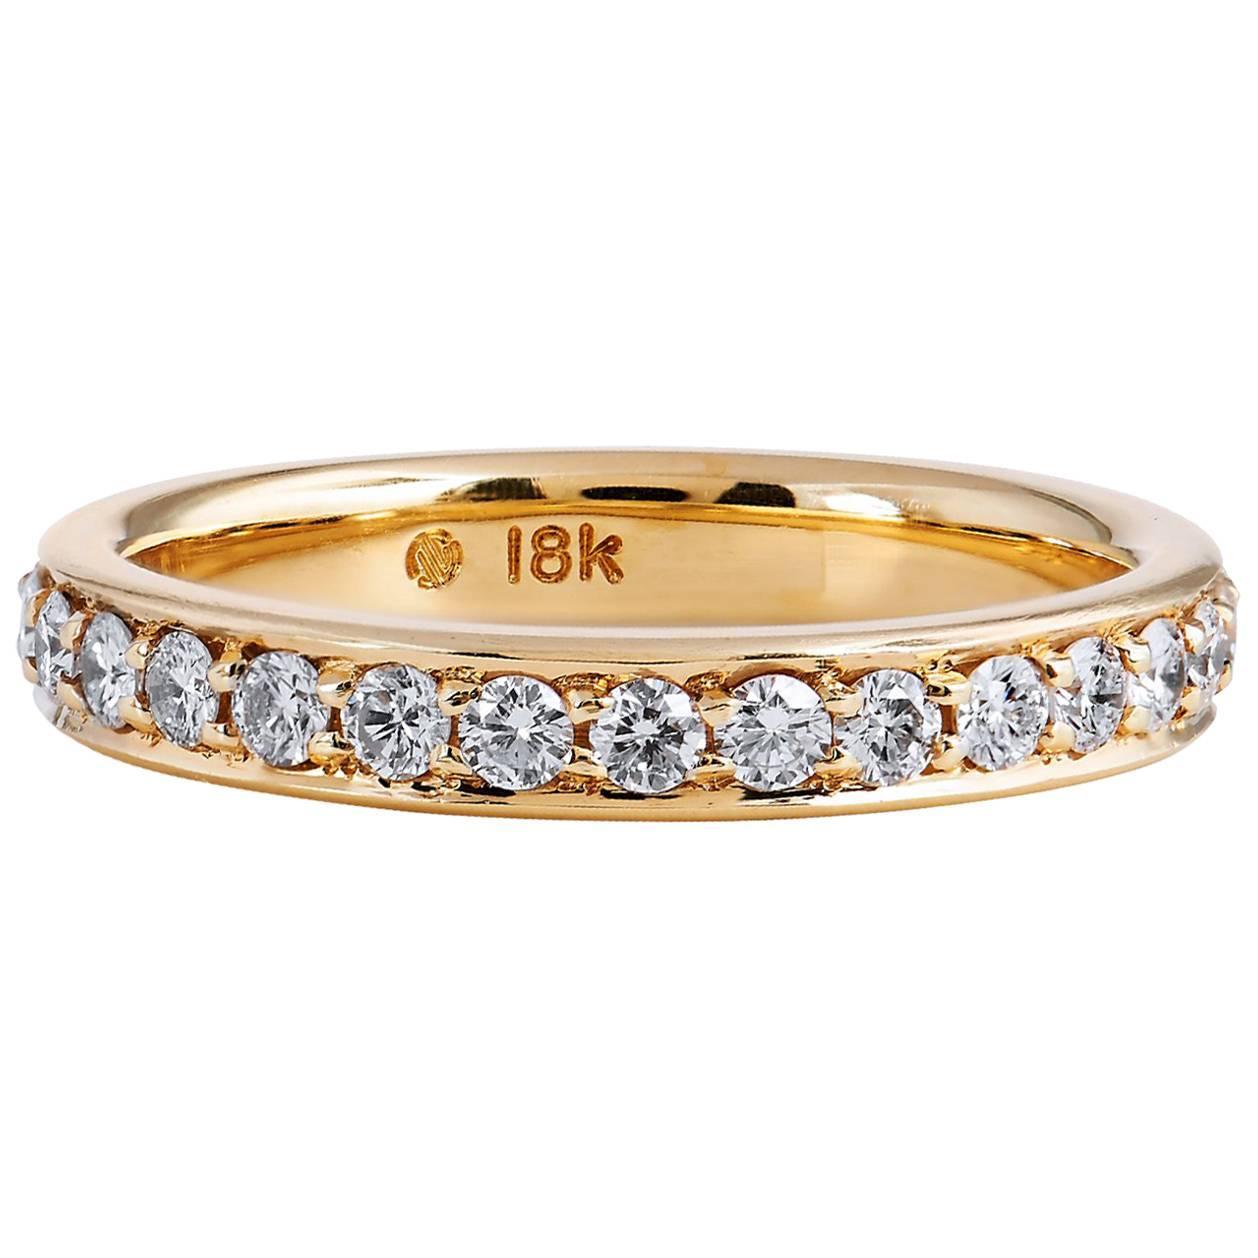 18 Karat Yellow Gold 0.67 Carat Diamond Eternity Wedding Band Ring